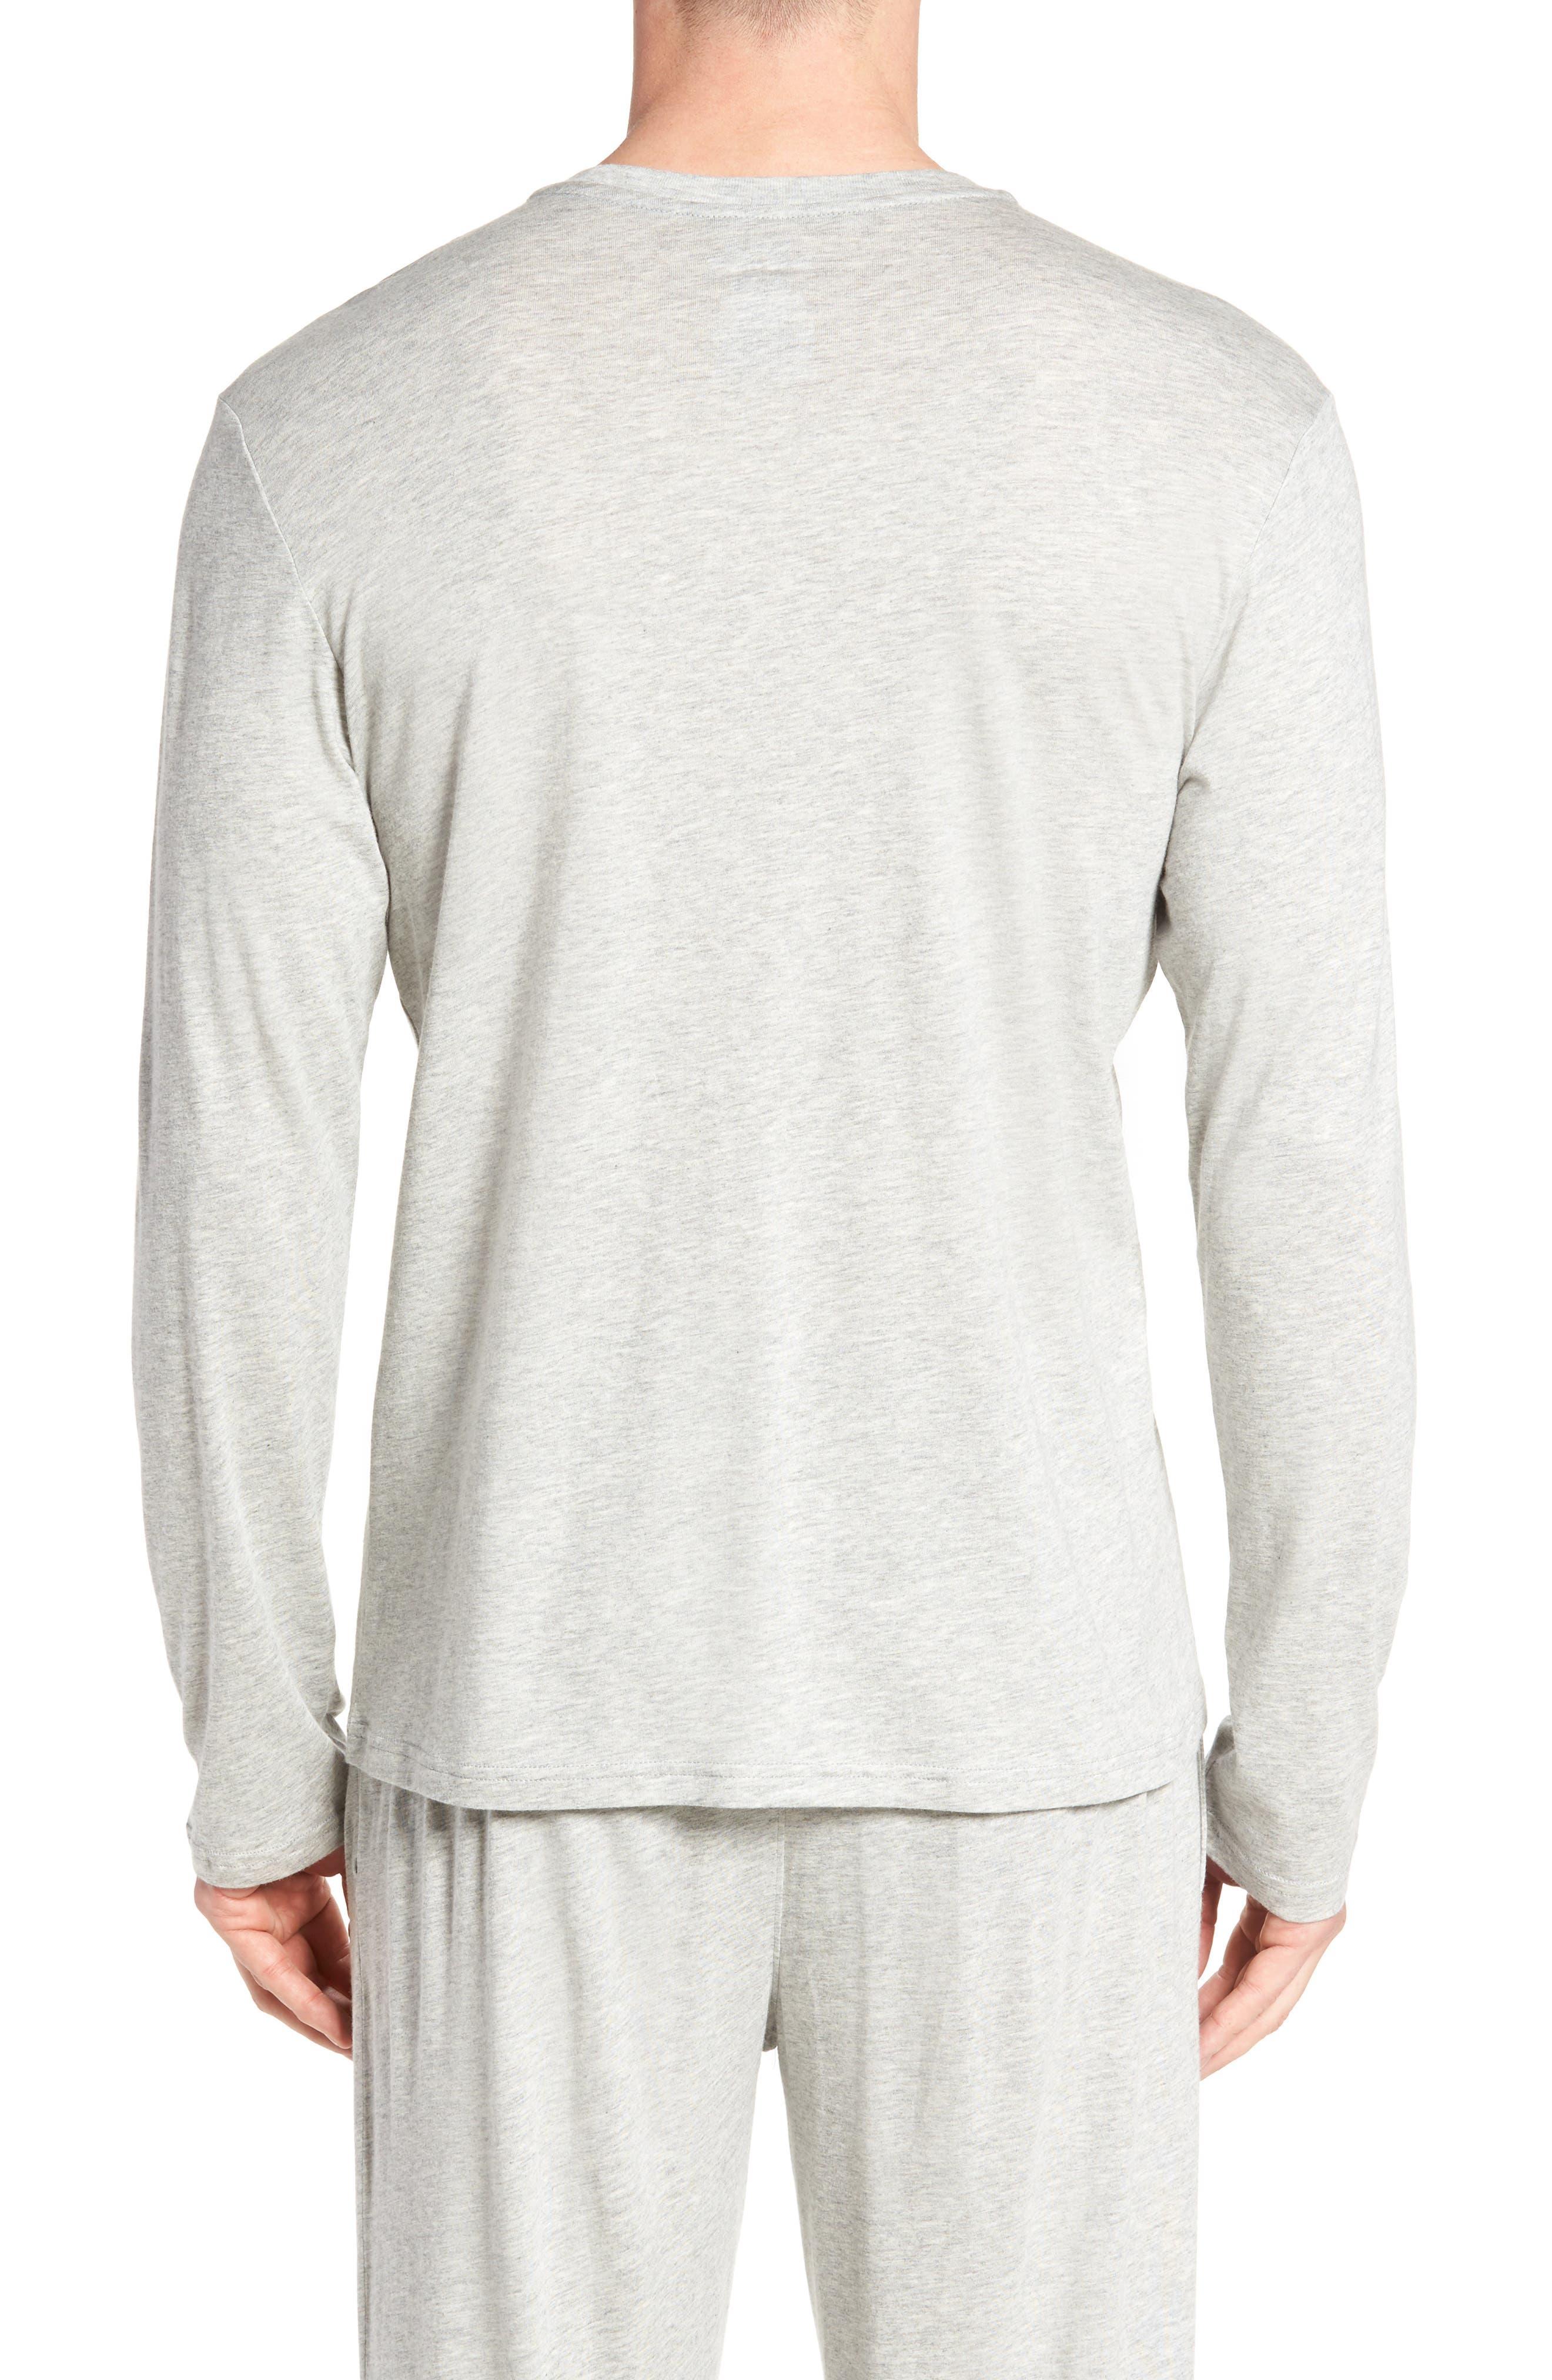 Supreme Comfort Cotton & Modal T-Shirt,                             Alternate thumbnail 2, color,                             024